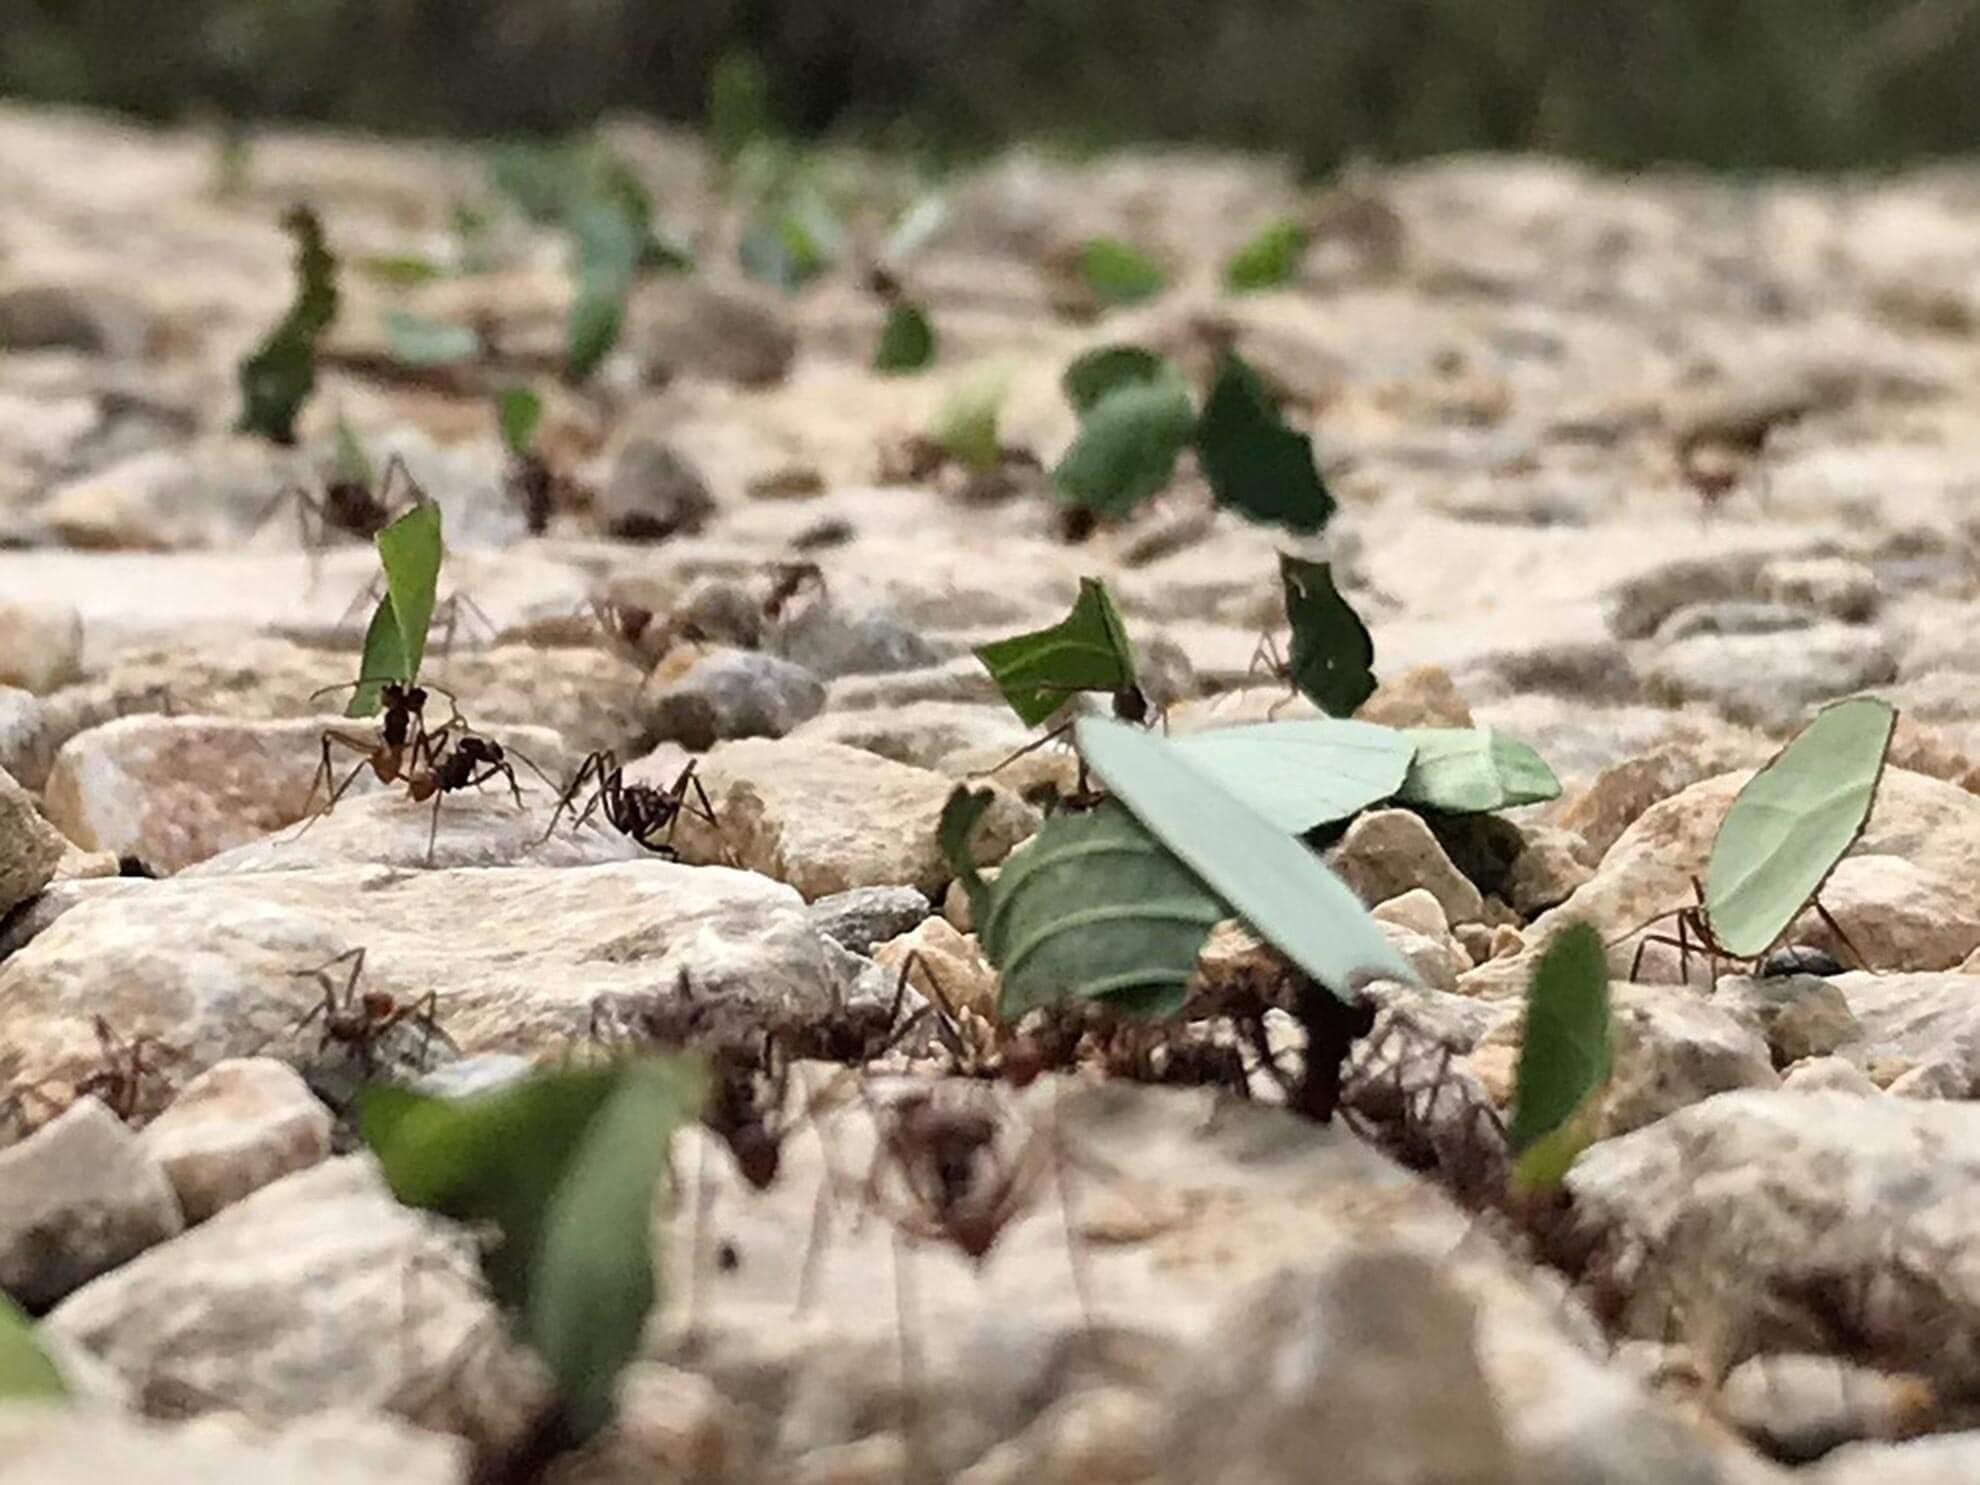 Ants in Belize